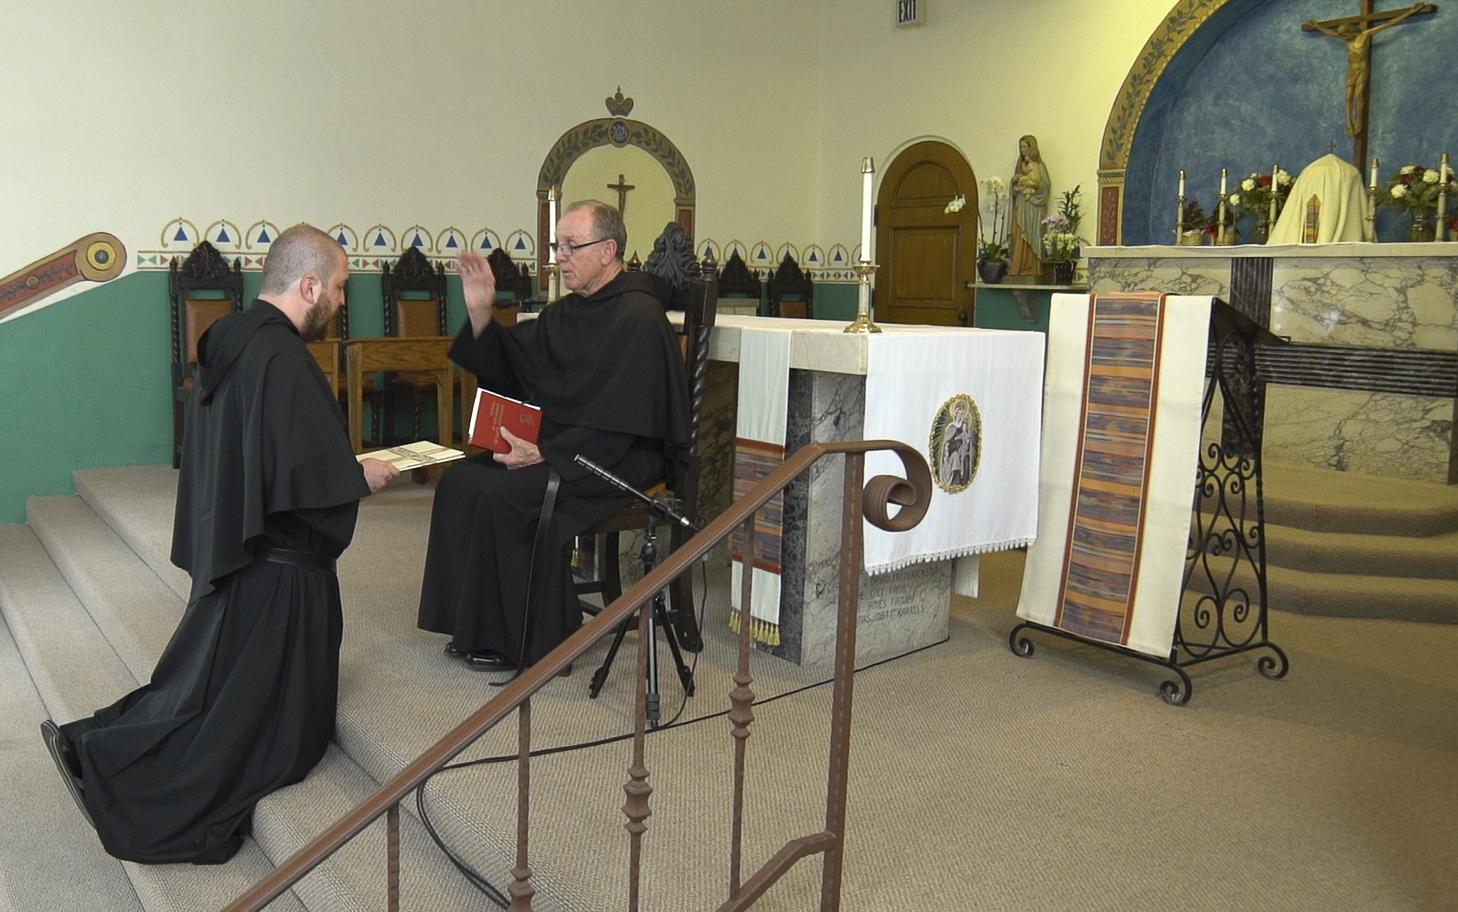 Br. Max Professes his Vows